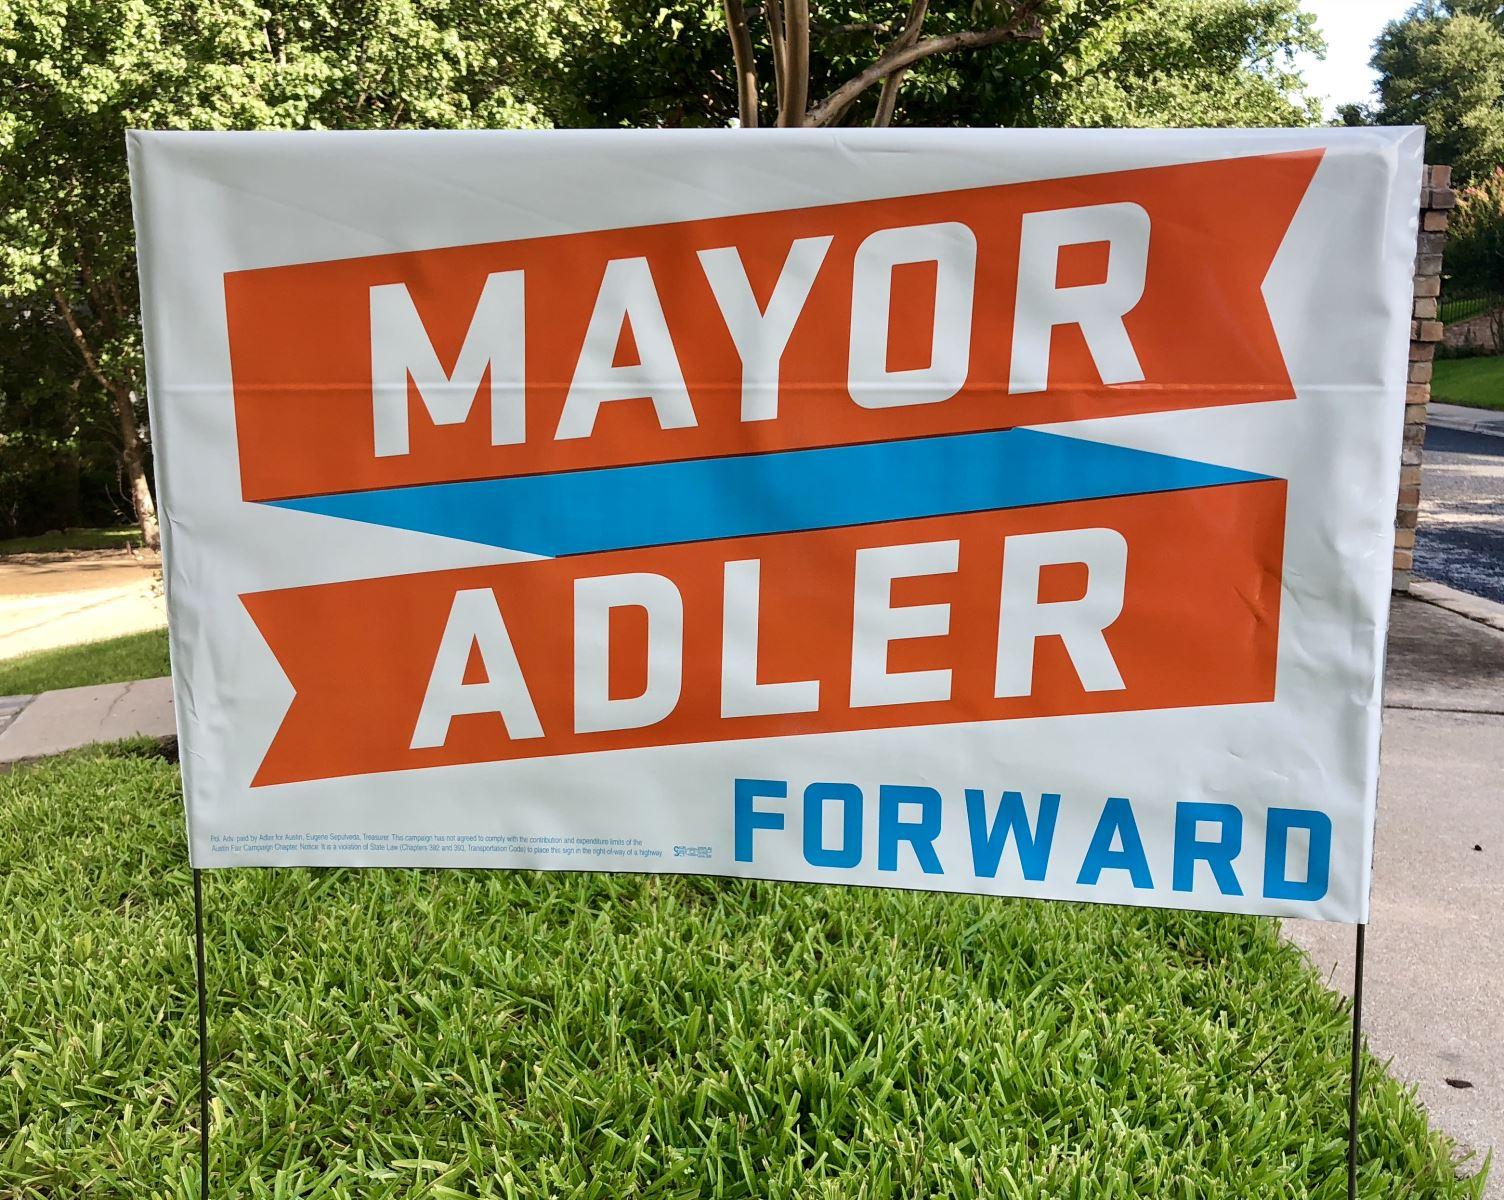 yard sign pic(2).jpg